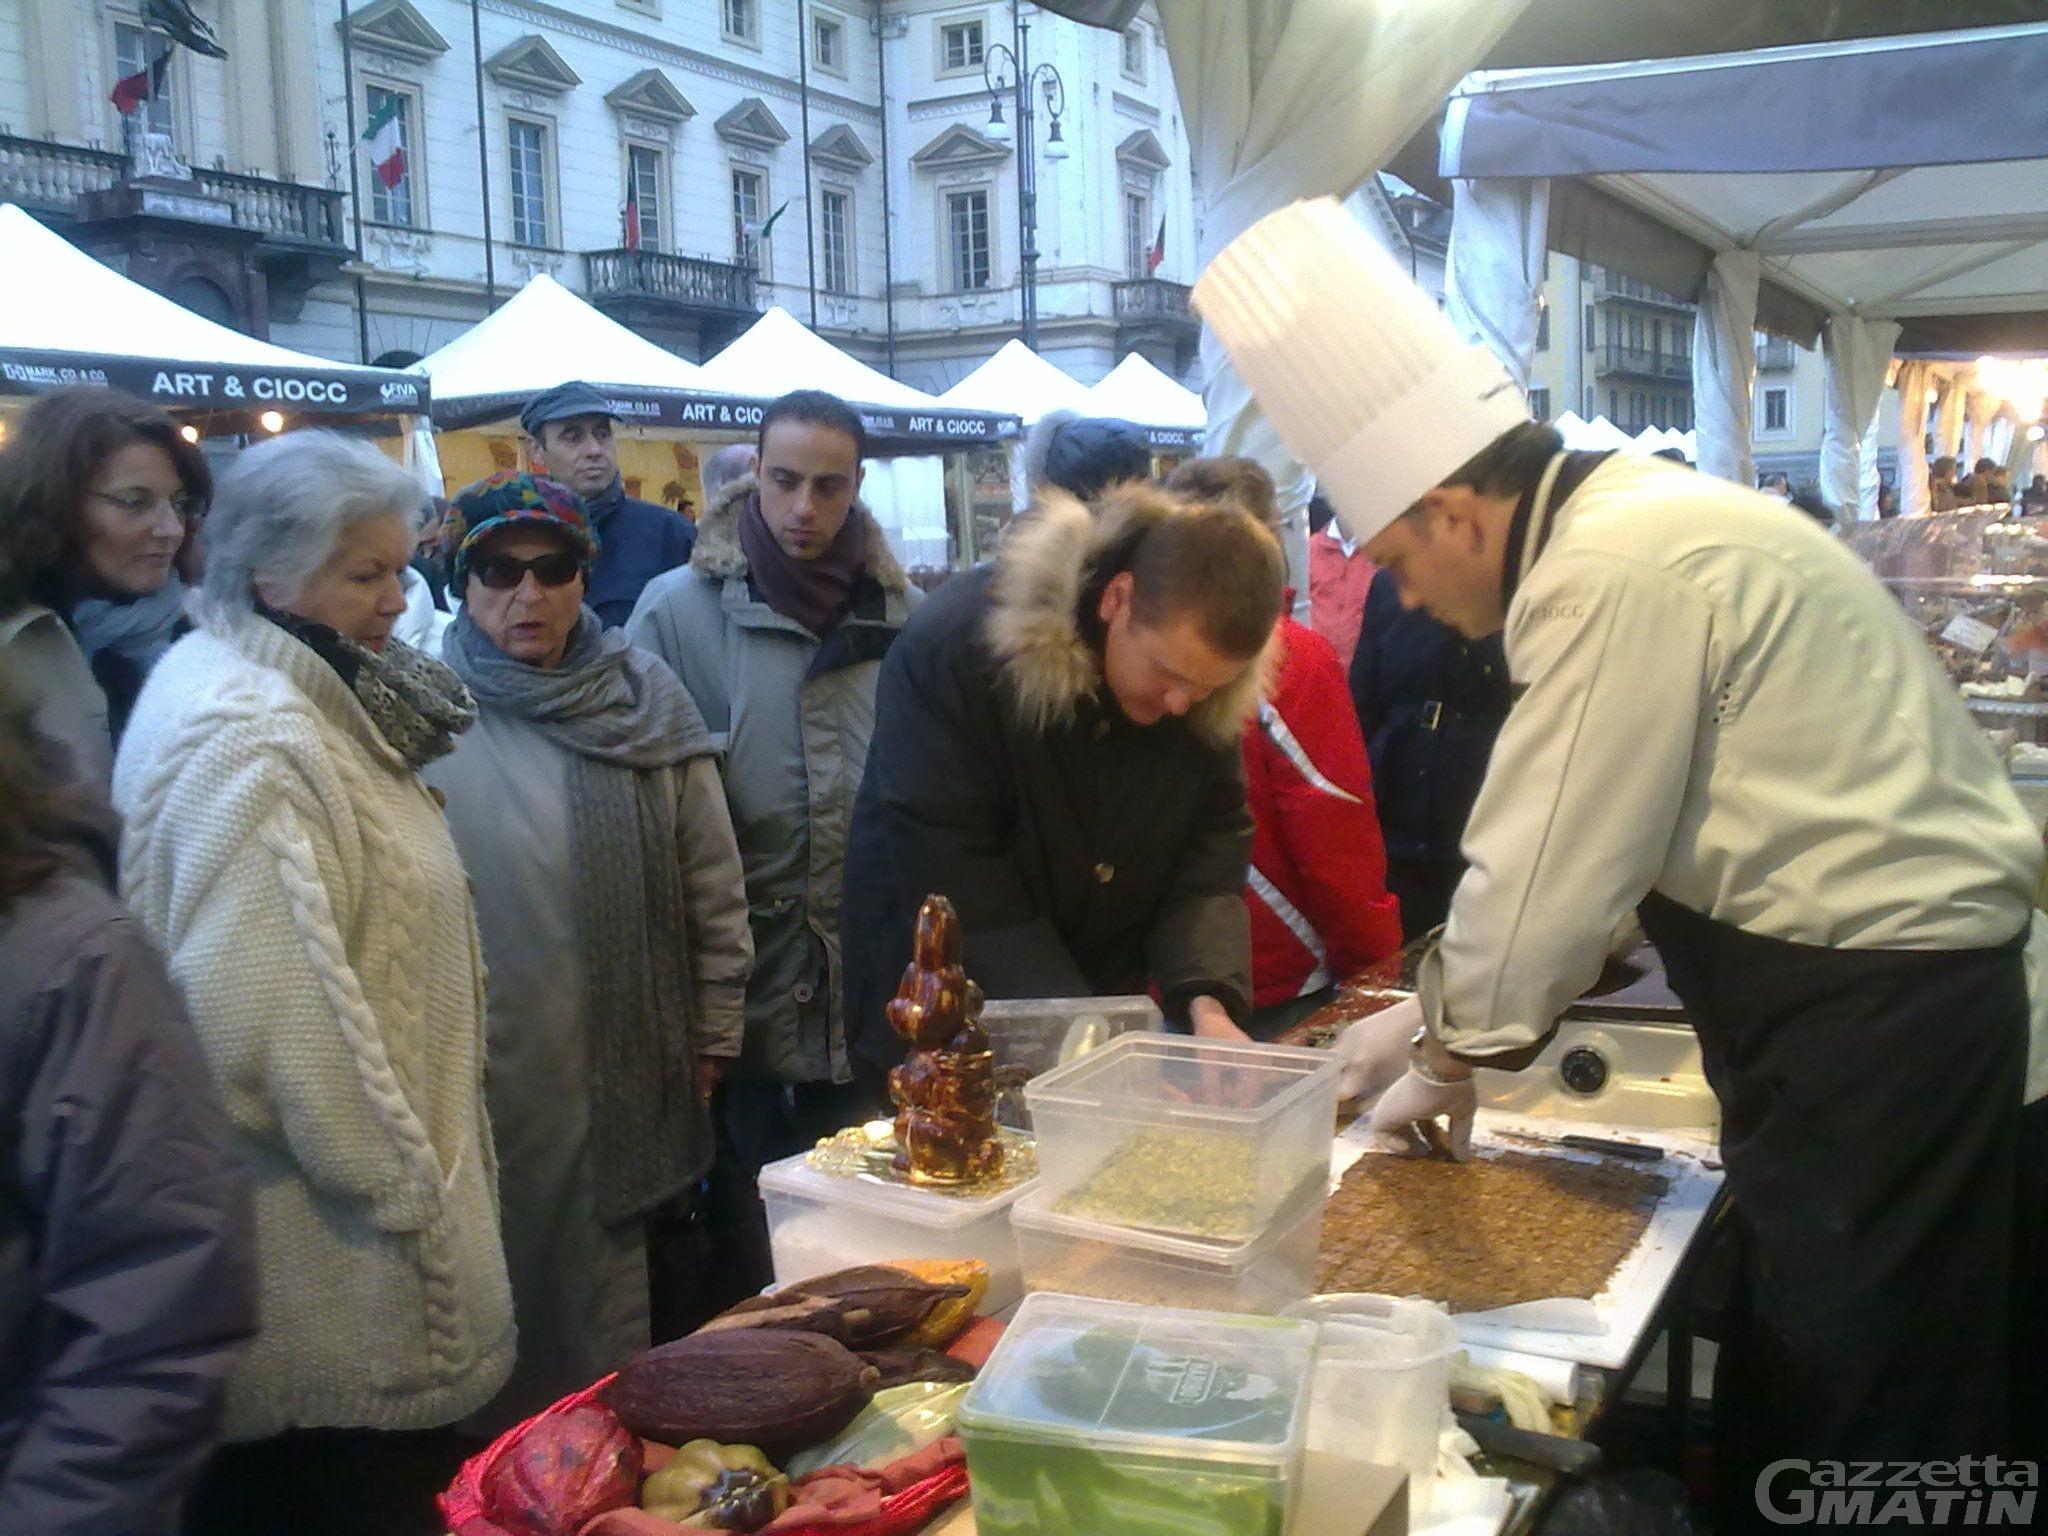 Aosta, a fine ottobre torna Art & Ciocc